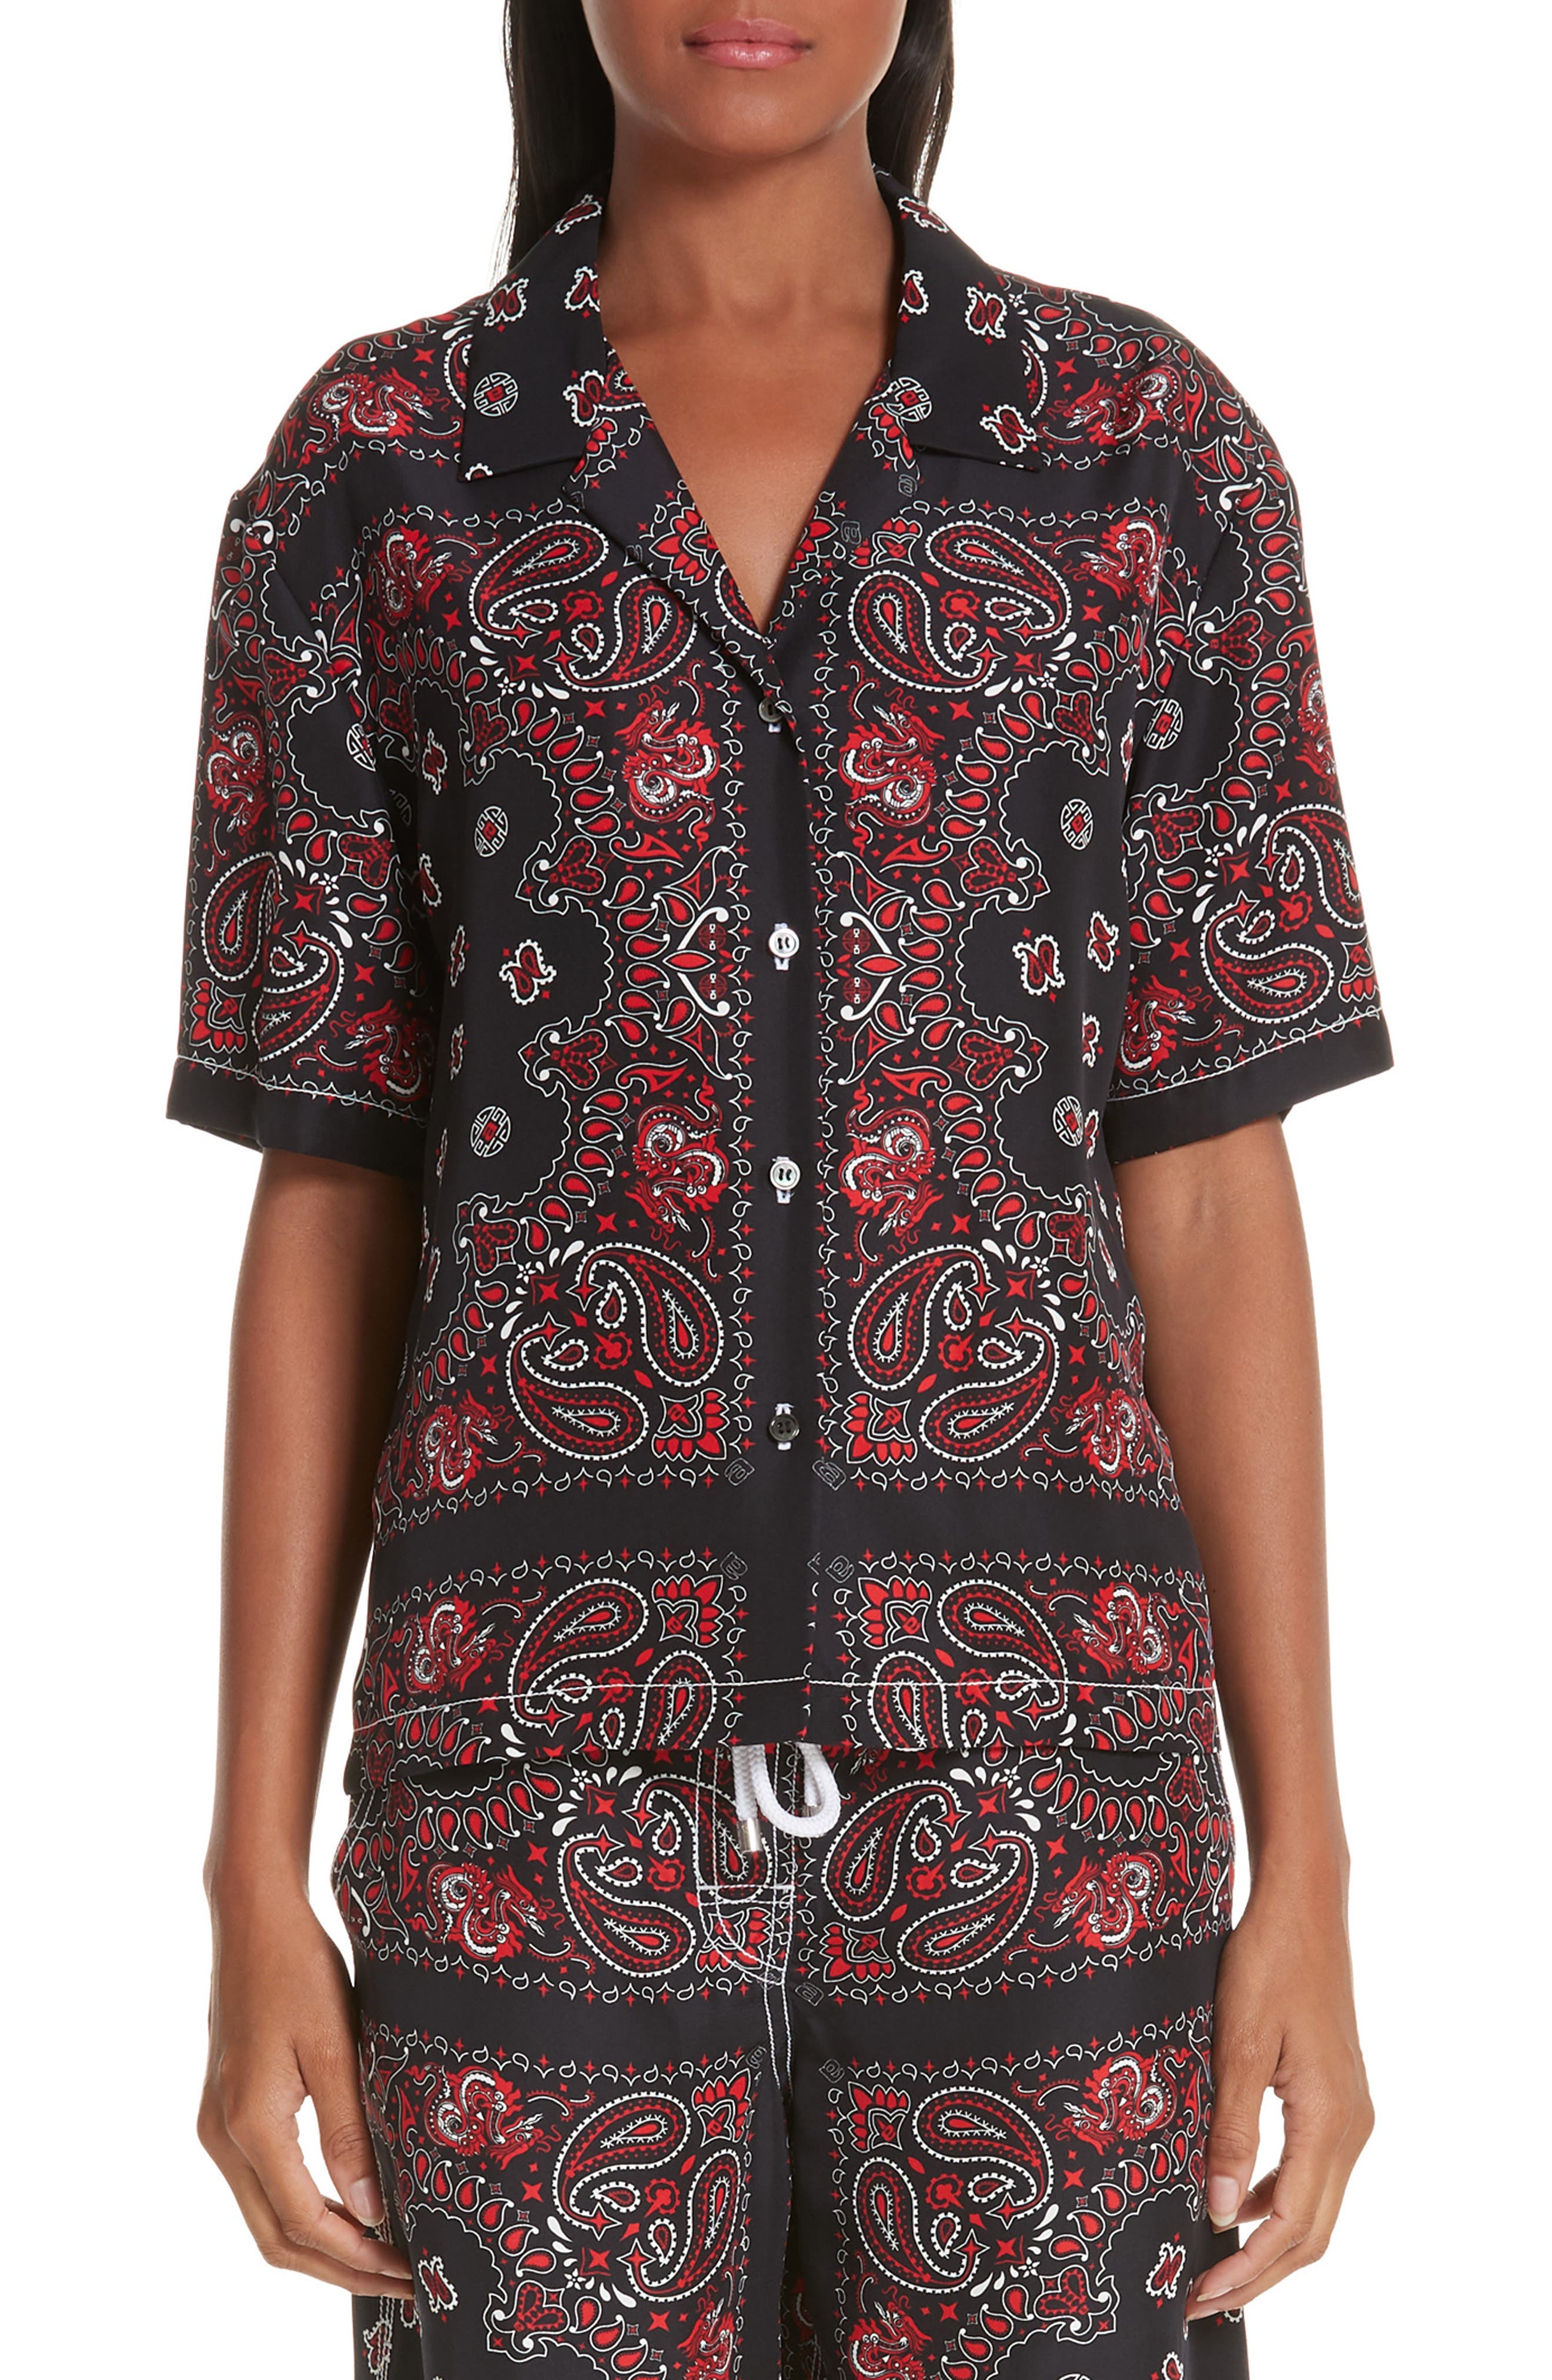 ALEXANDER WANG Bandana Print Silk Shirt, Main, color, BLACK/ RED